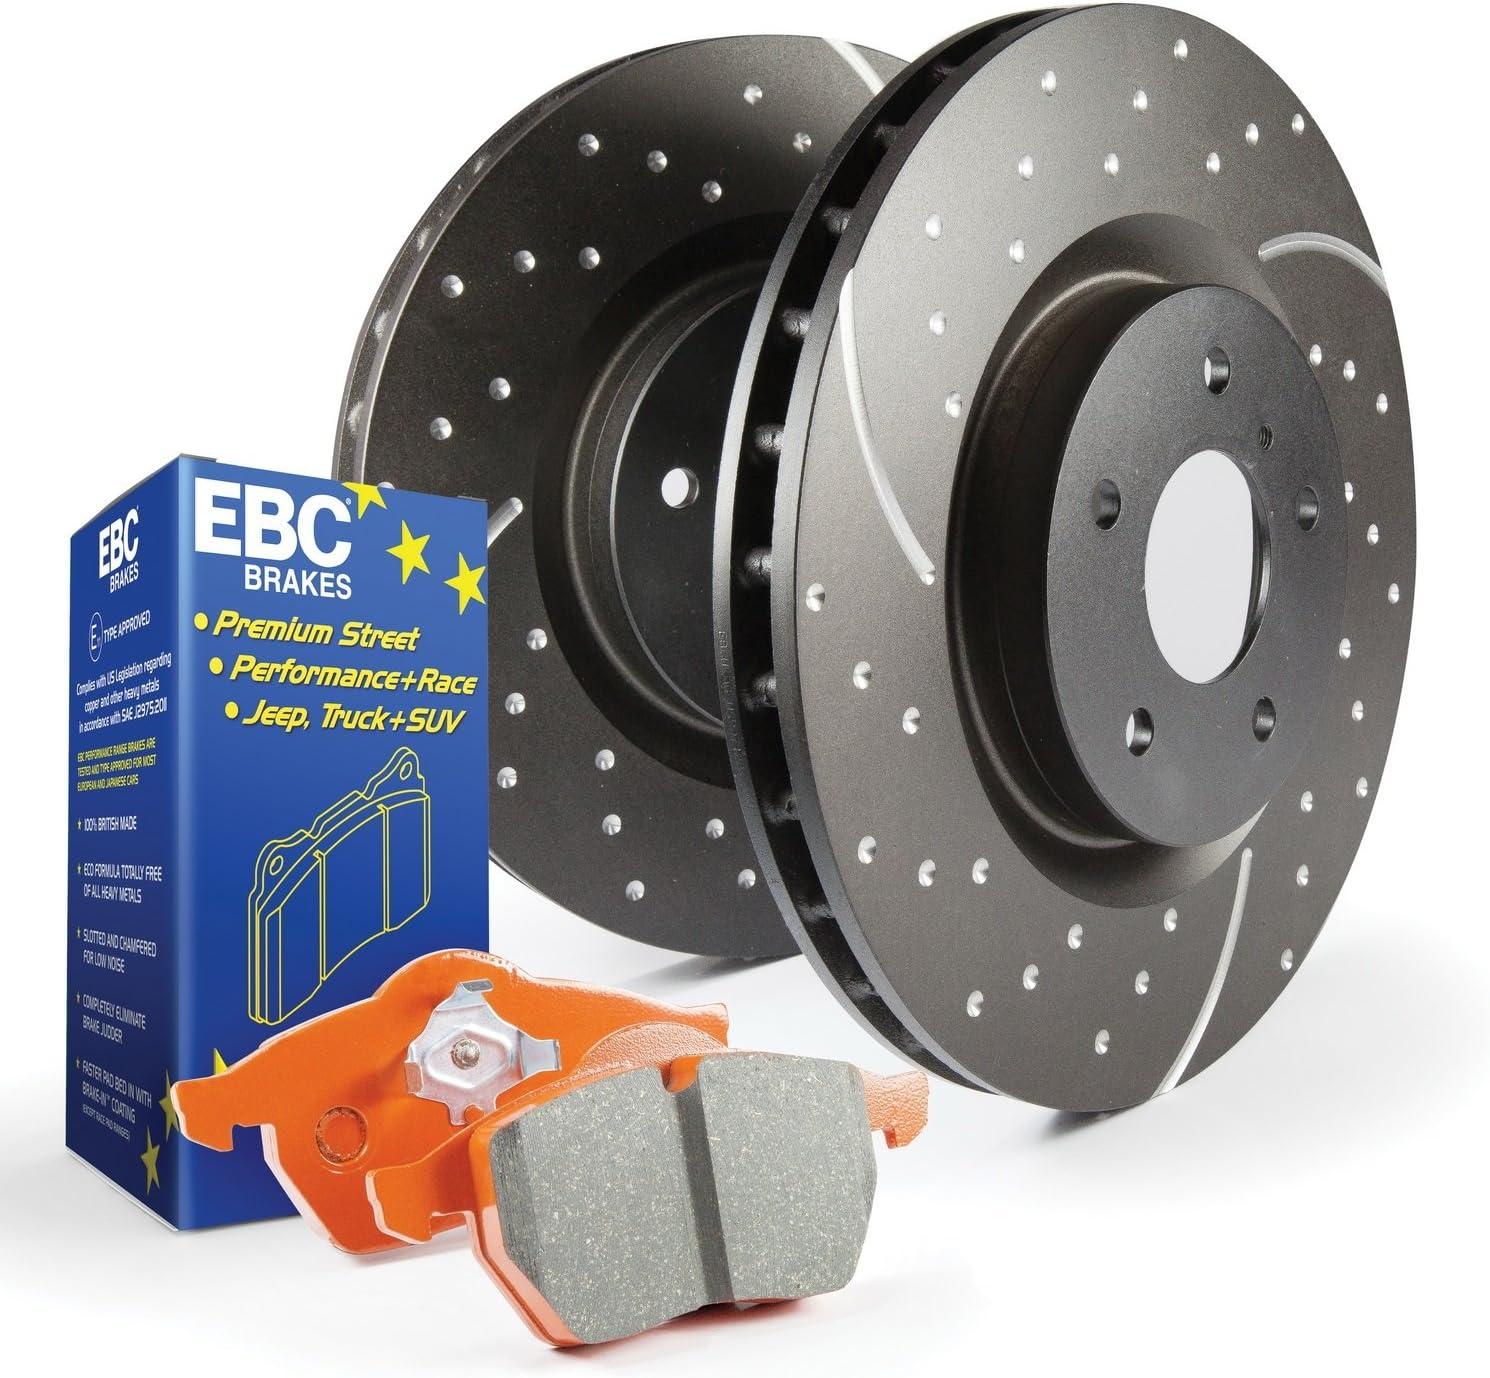 EBC S8KF1196 Be super welcome 1 year warranty Kit Brake